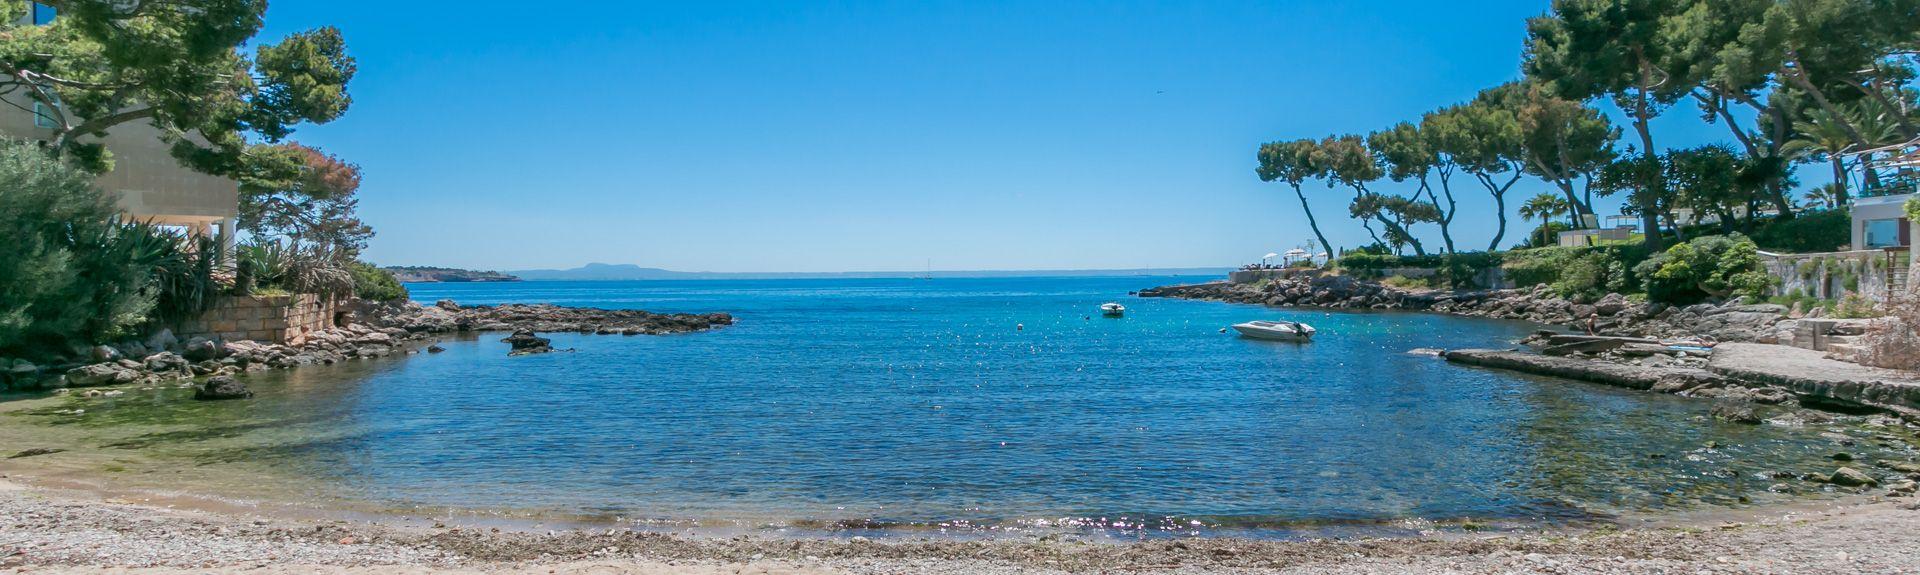 Cala Vinas, Calvia, Balearic Islands, Spain